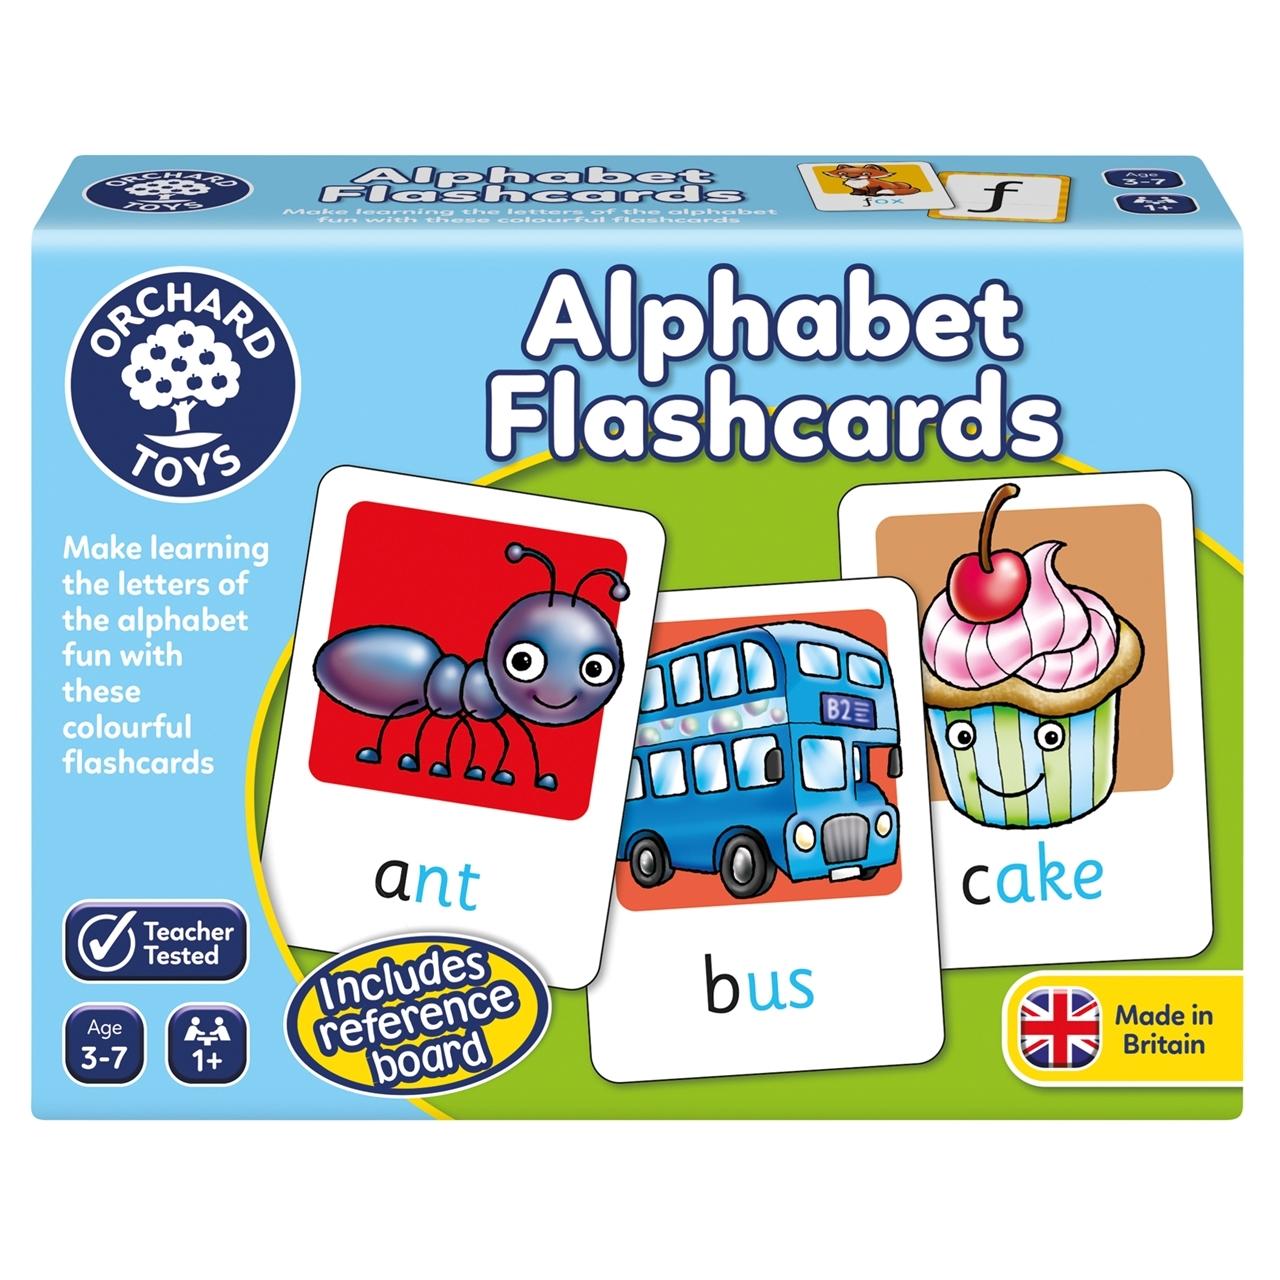 Joc educativ in limba engleza - Alphabet FlashCards - Orchard Toys